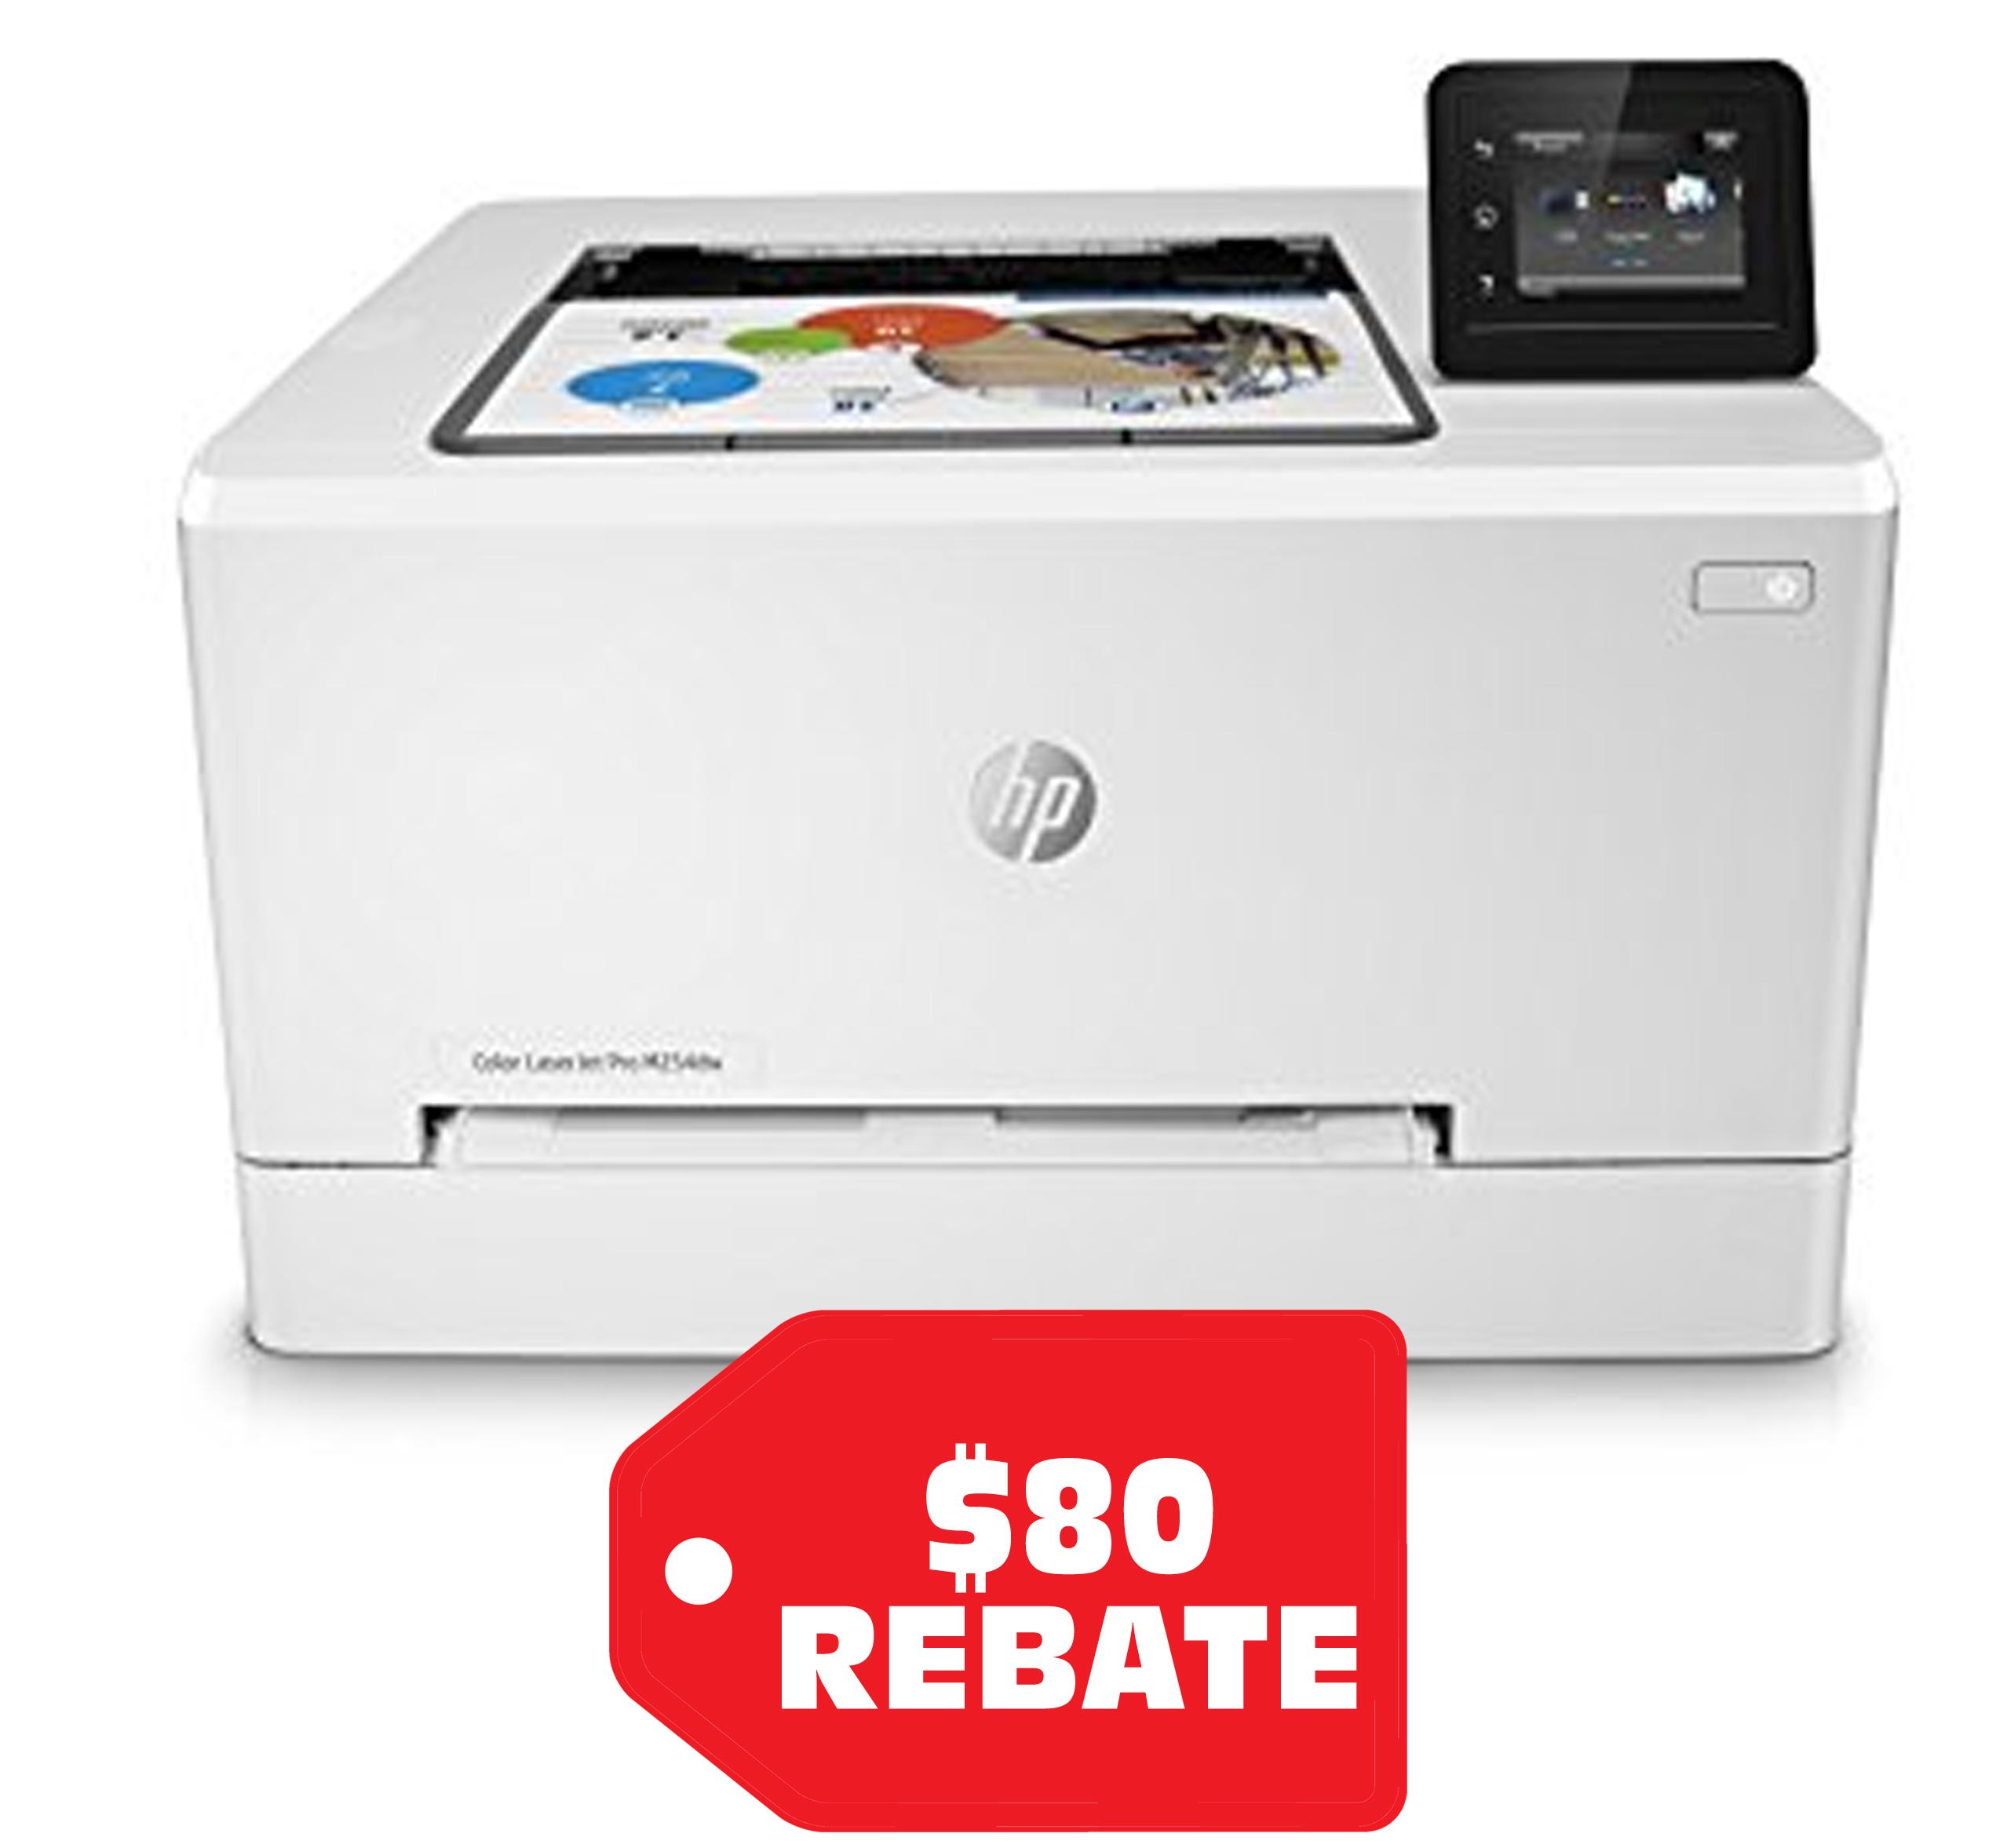 HP Color LaserJet Pro M254dw 22ppm/ 22ppm Printer